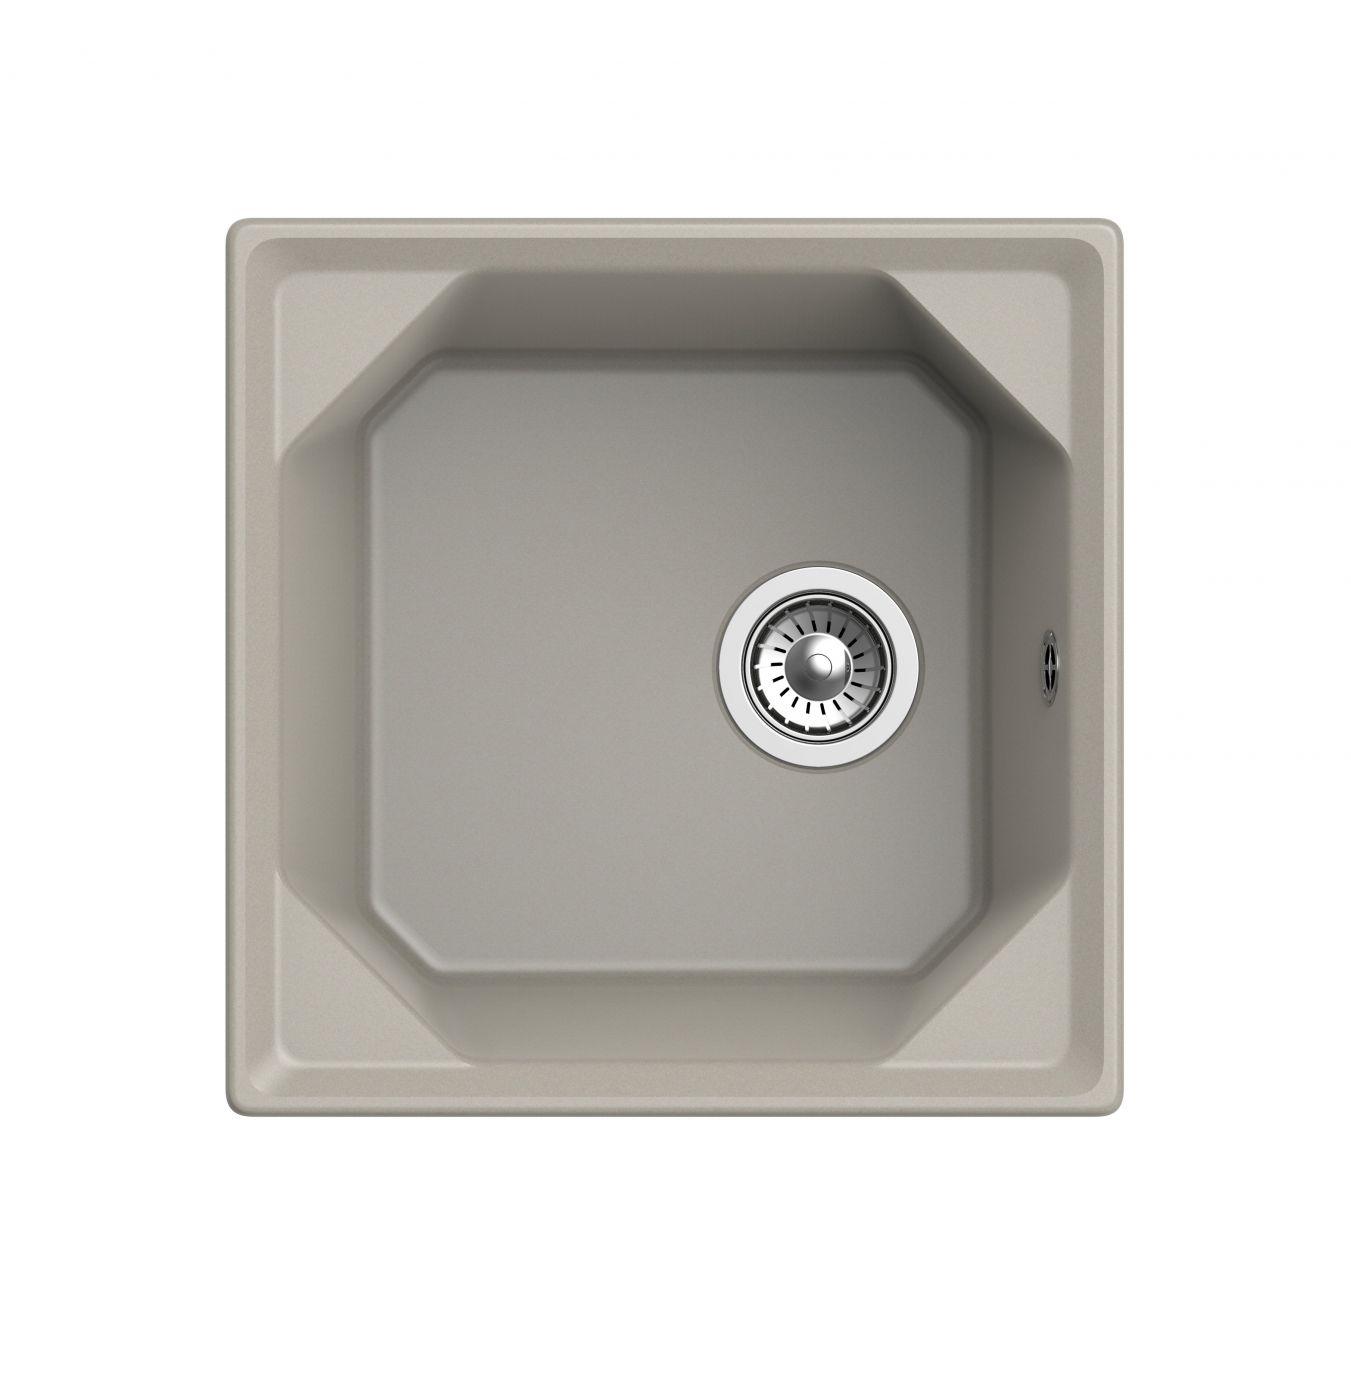 Мраморная мойка для кухни GranFest Unique GF-U500 Топаз